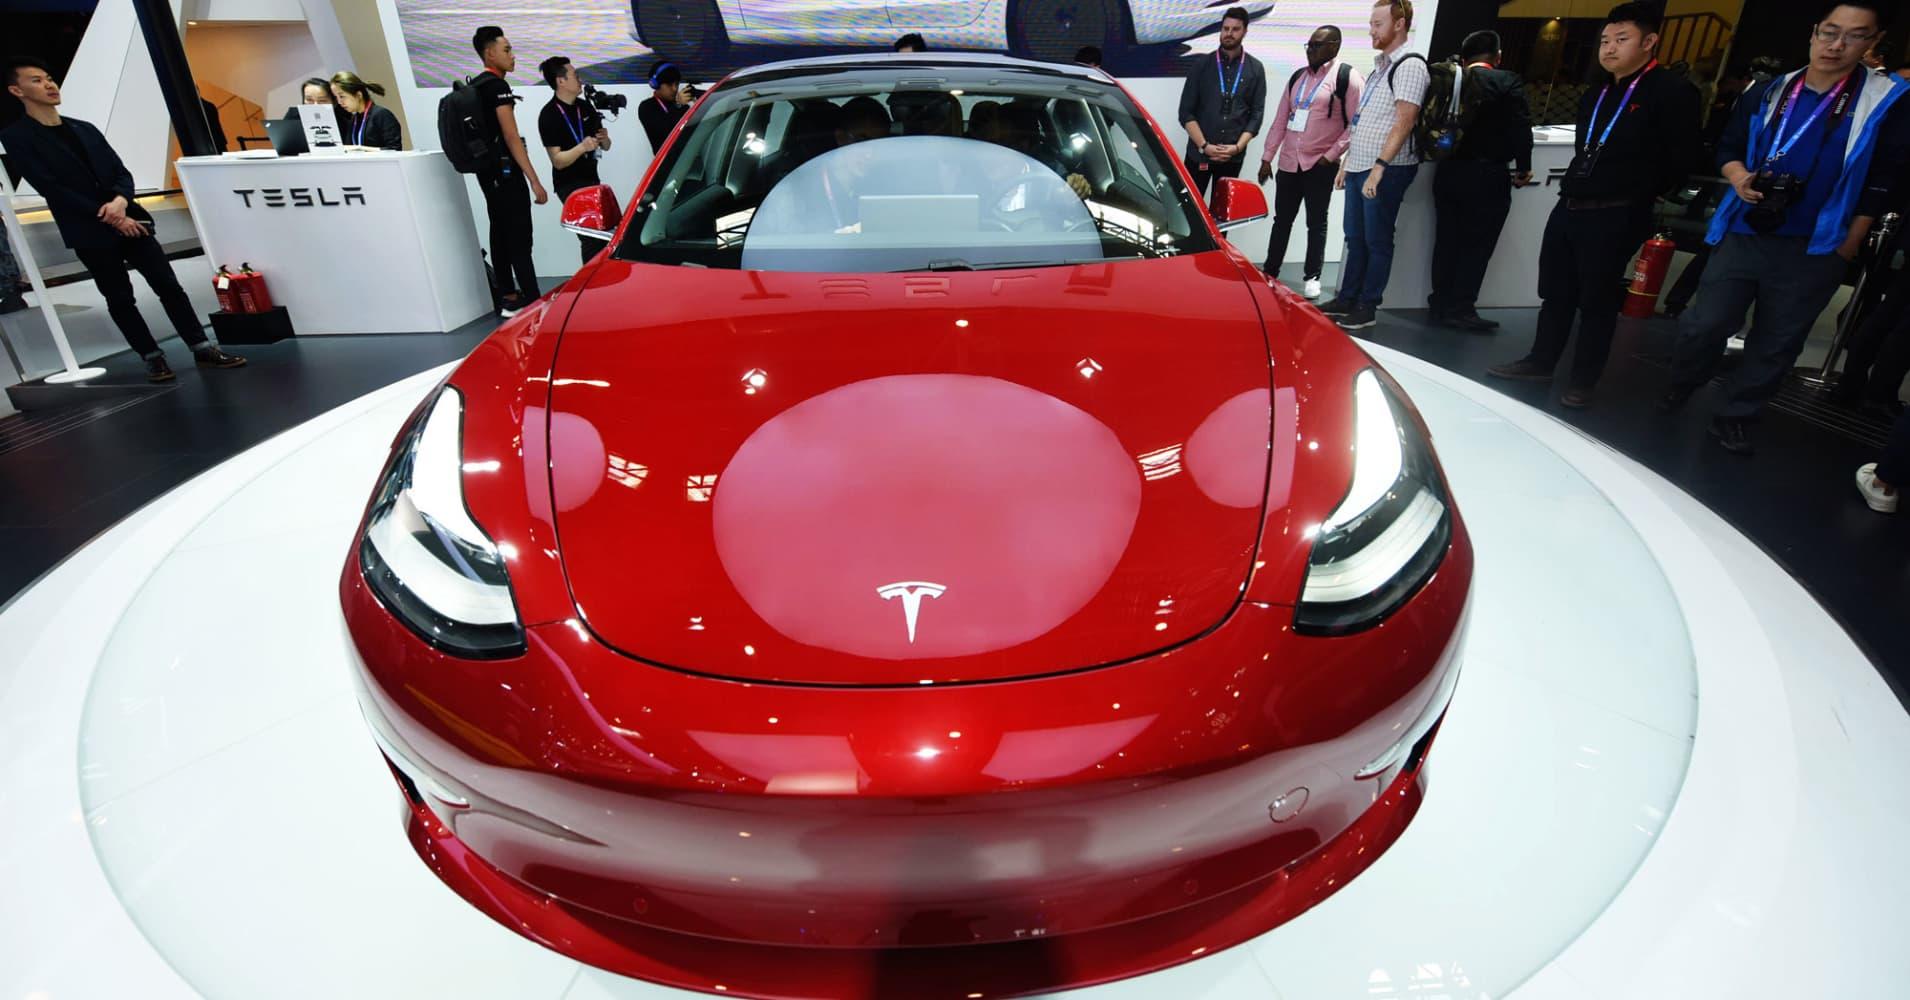 Tesla opens Model 3 sales in Mexico